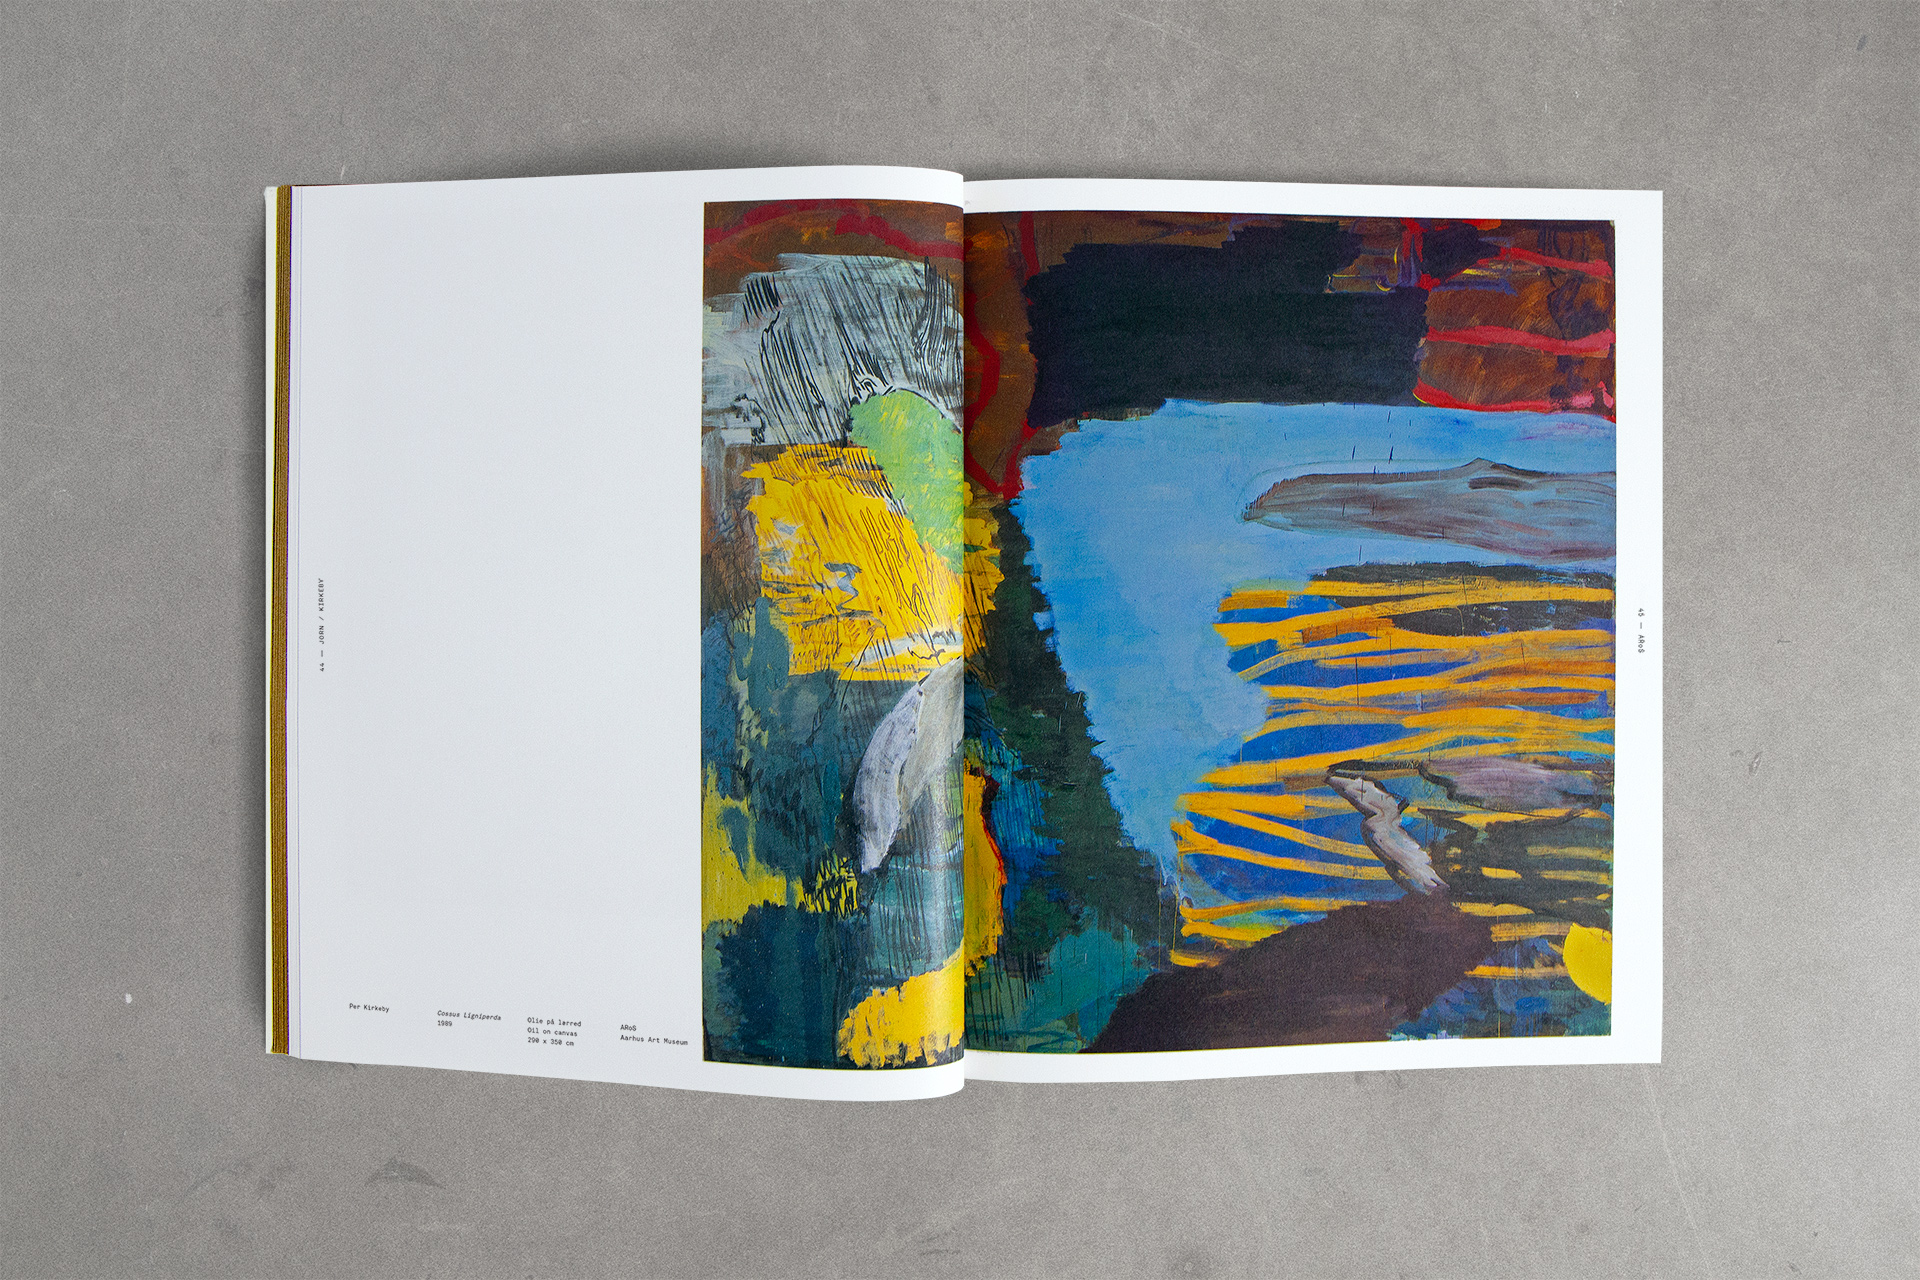 aros-jorn-kirkeby-book-spread-02-ian-bennett